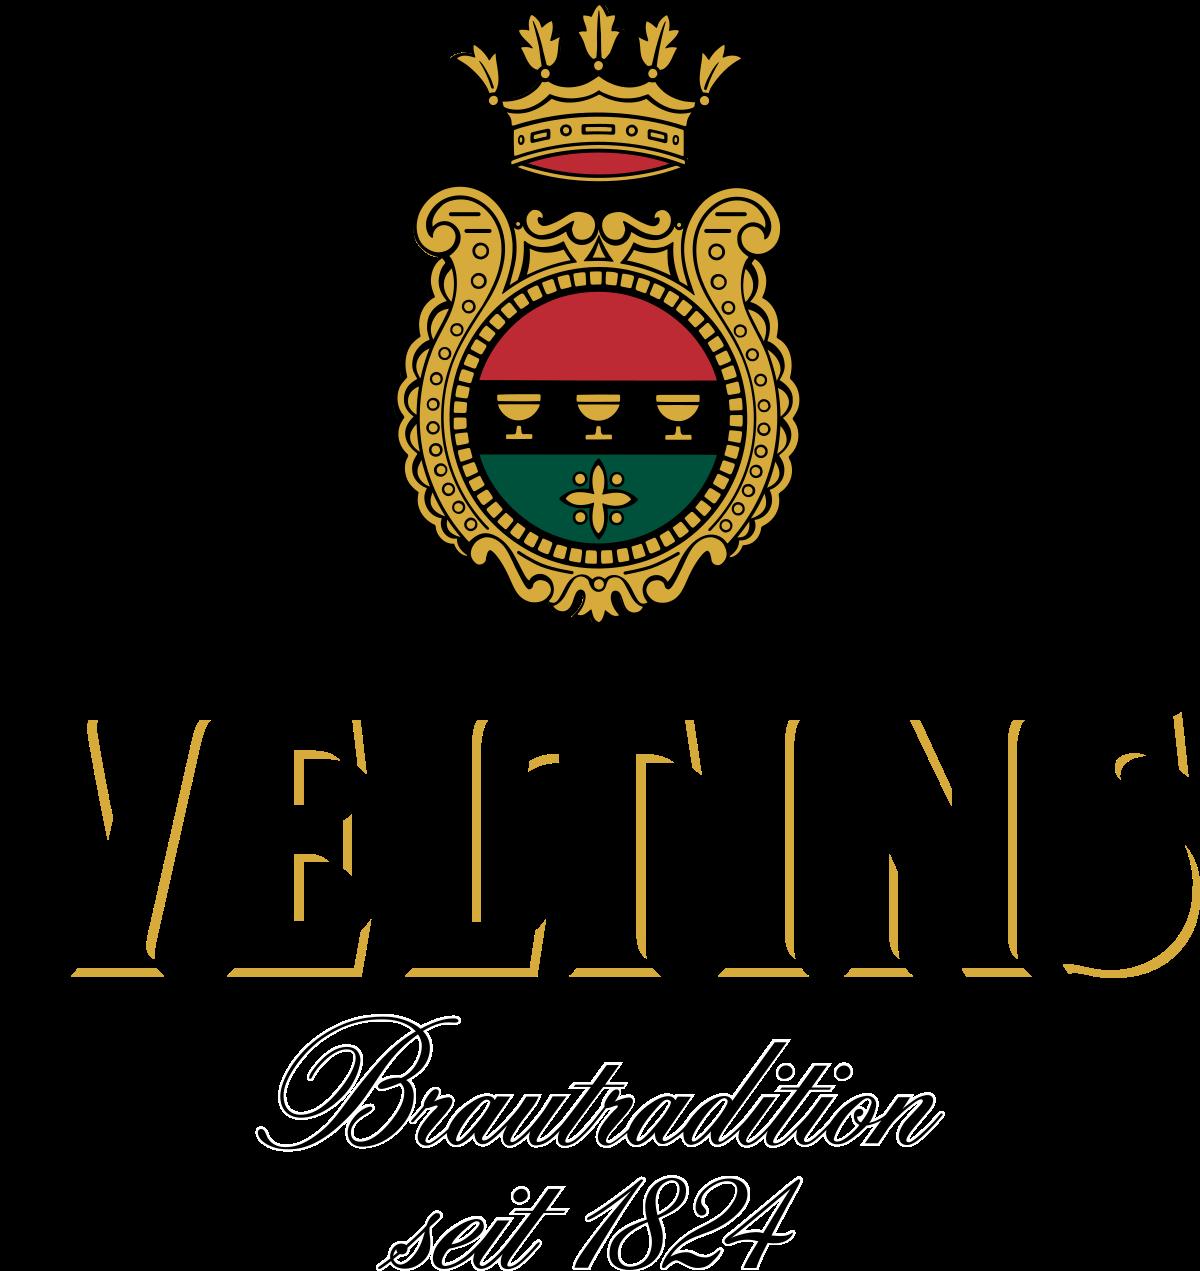 Велтинс, Veltins